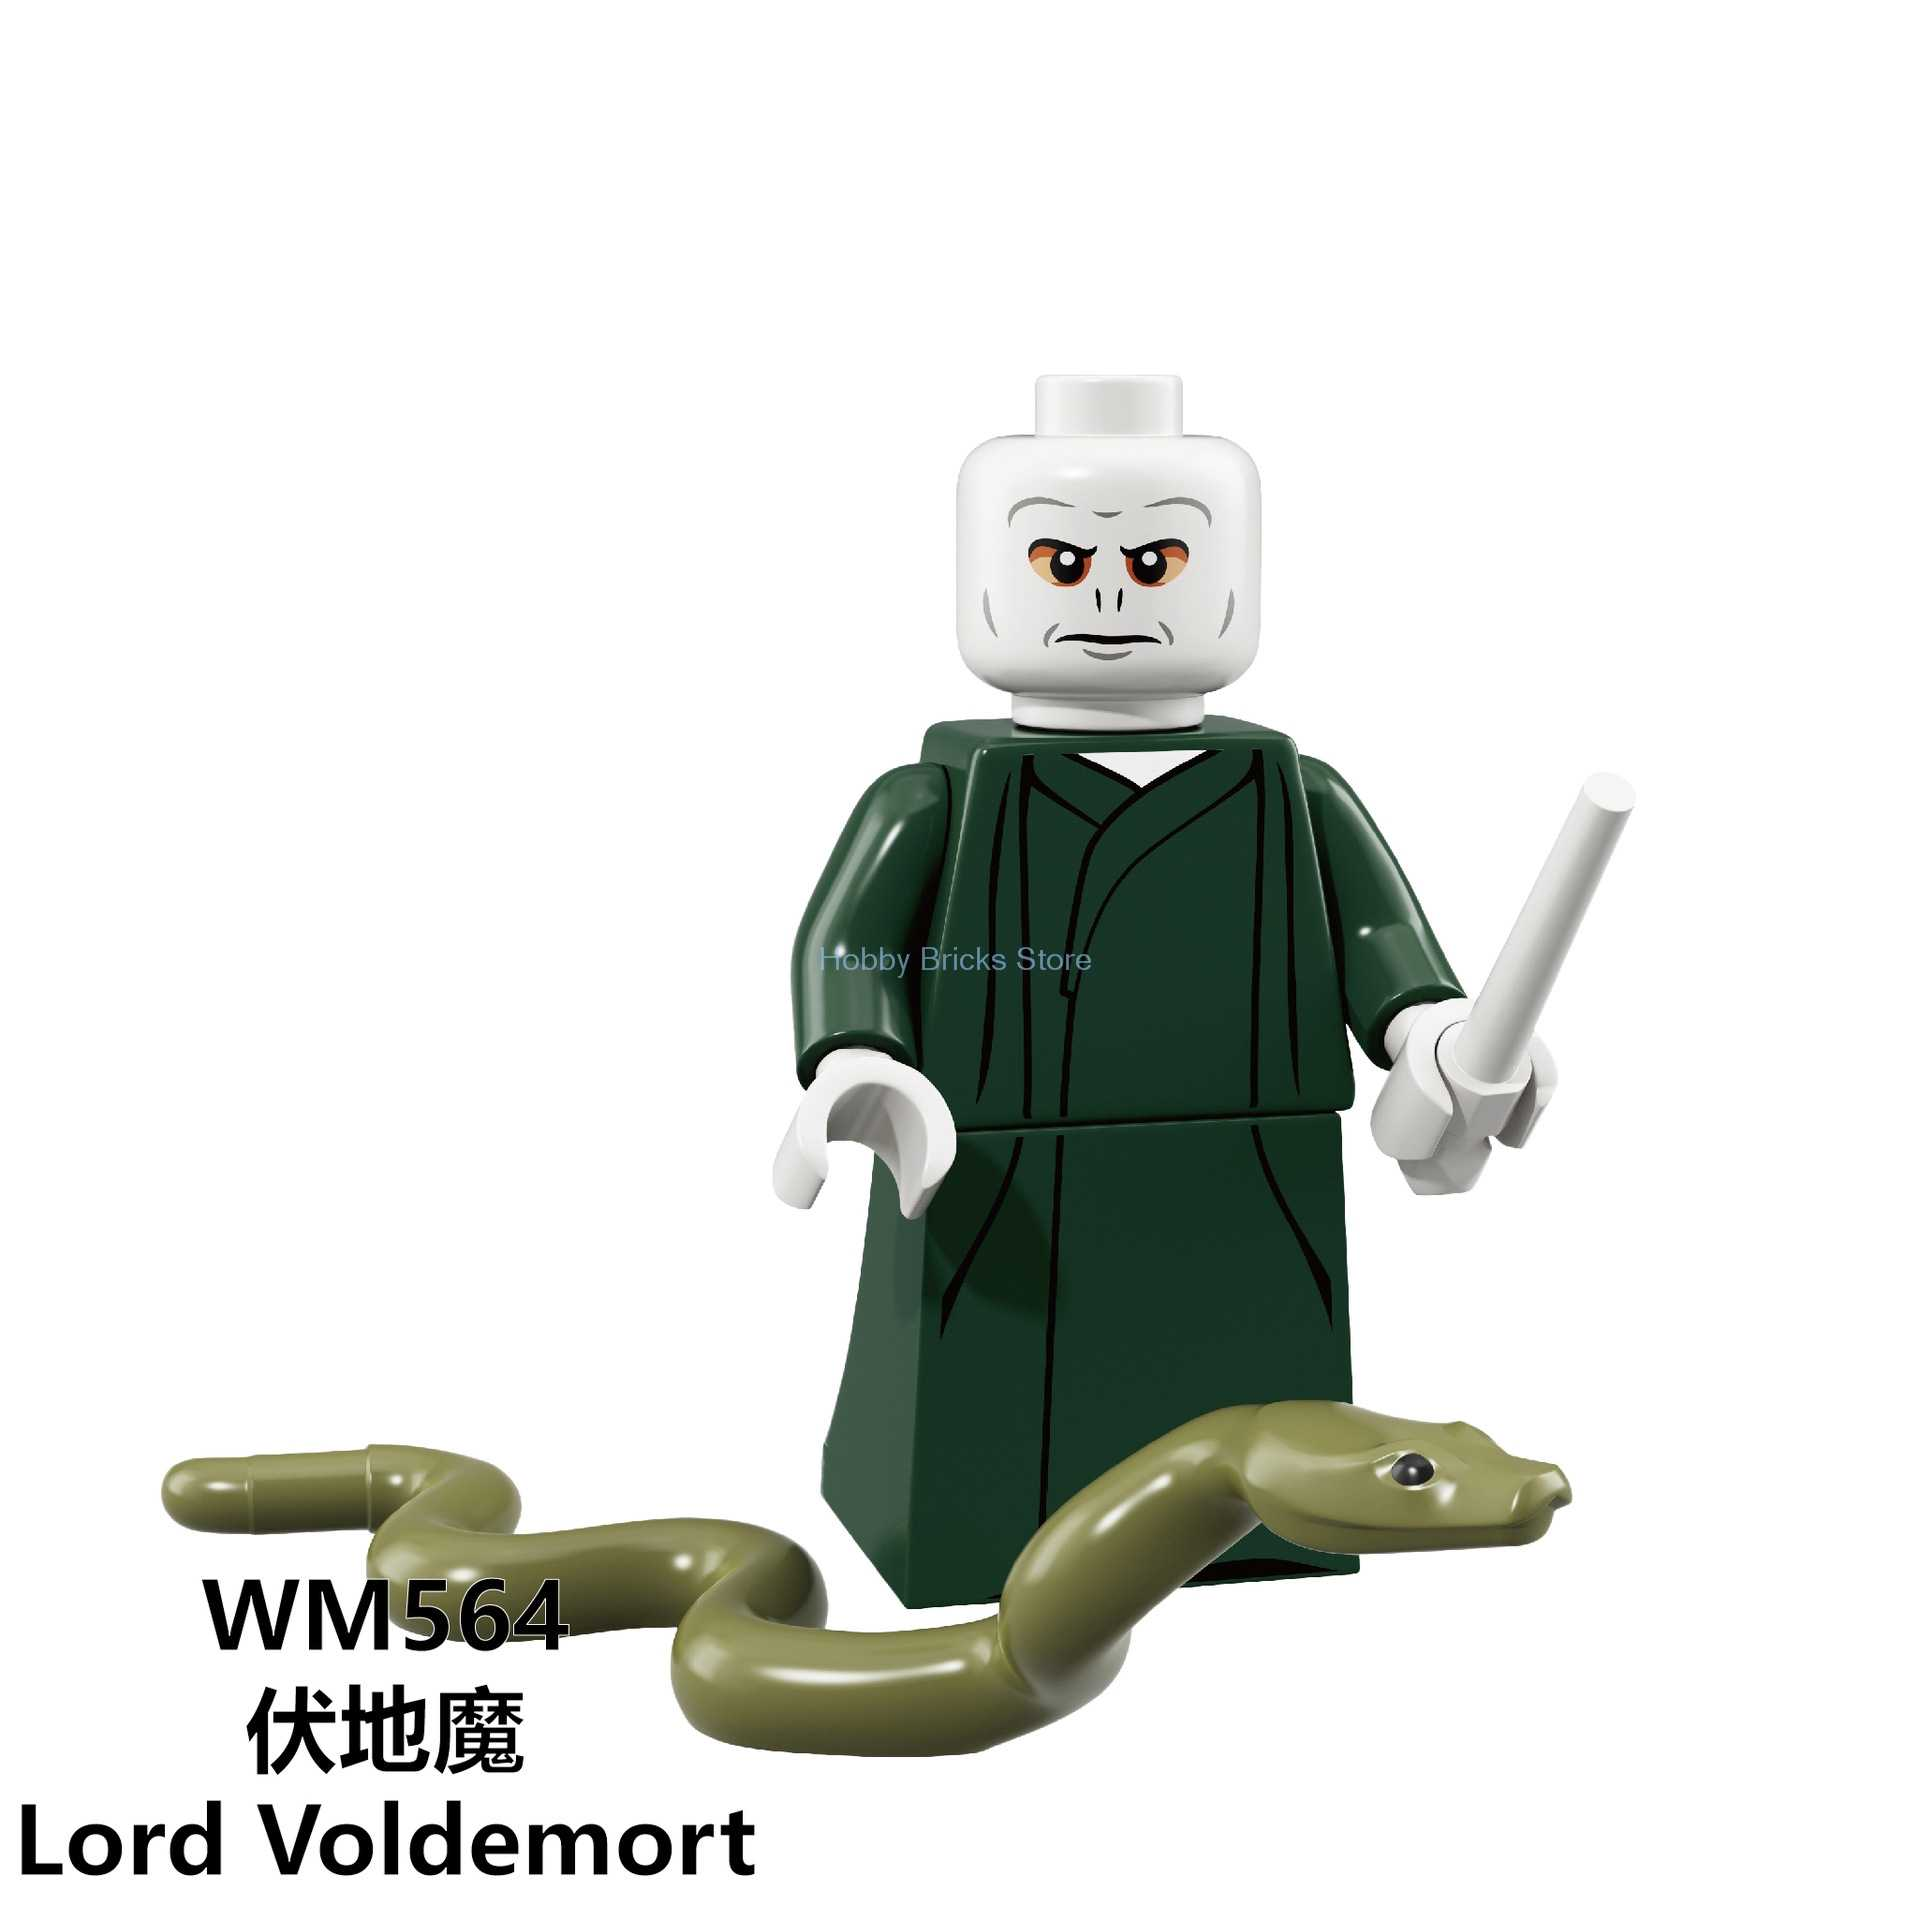 Magic Sirius Orion Hitam Harri Dobby Malfoy Dumbledore Minerva McGonagall Snape Hagrid Blok Bangunan Mainan Hadiah untuk Anak-anak